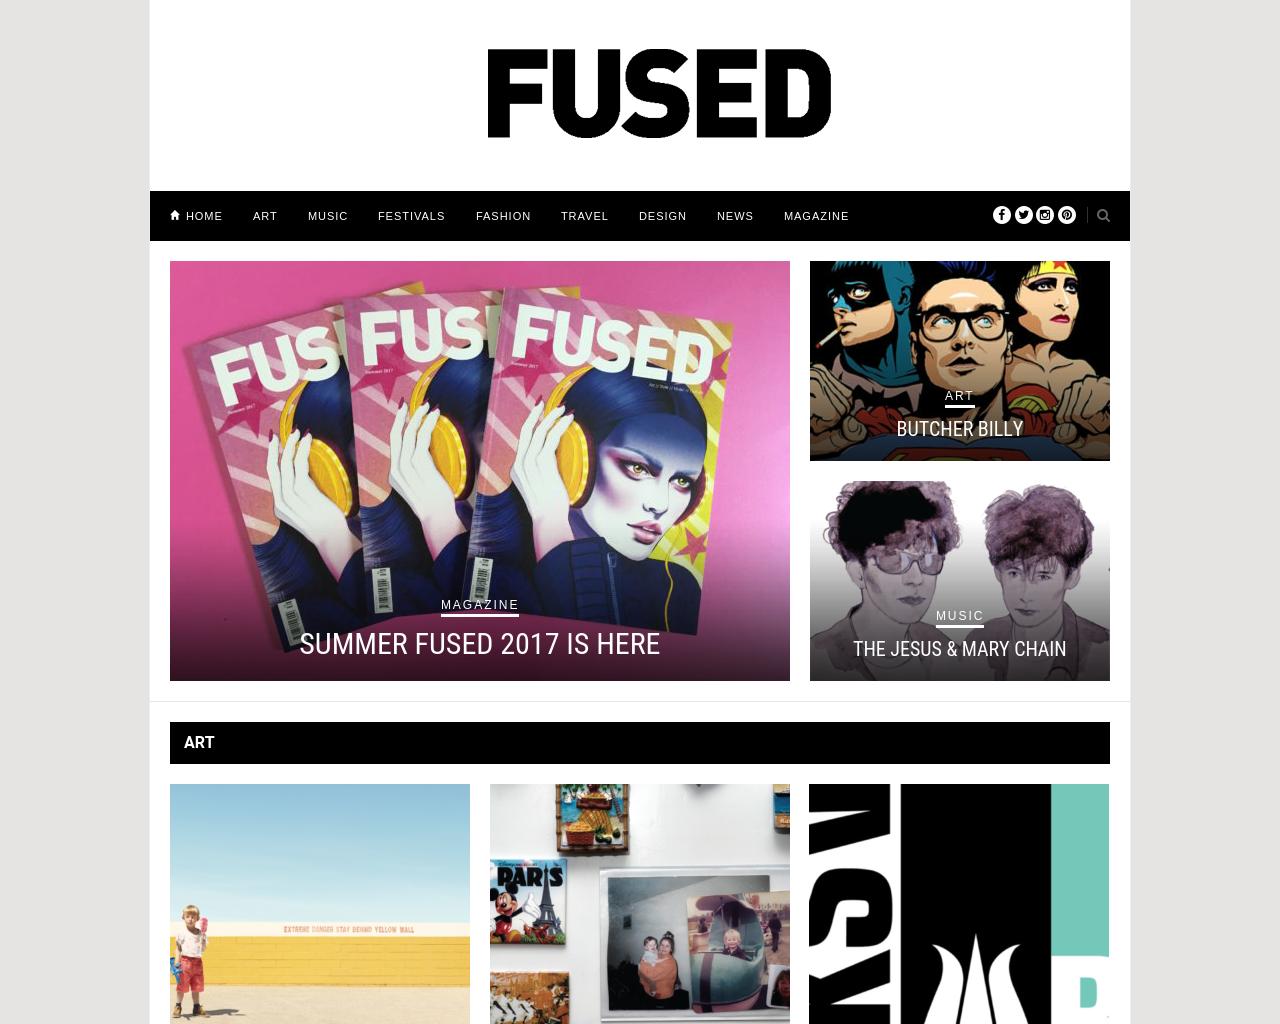 Fusedmagazine.com-Advertising-Reviews-Pricing